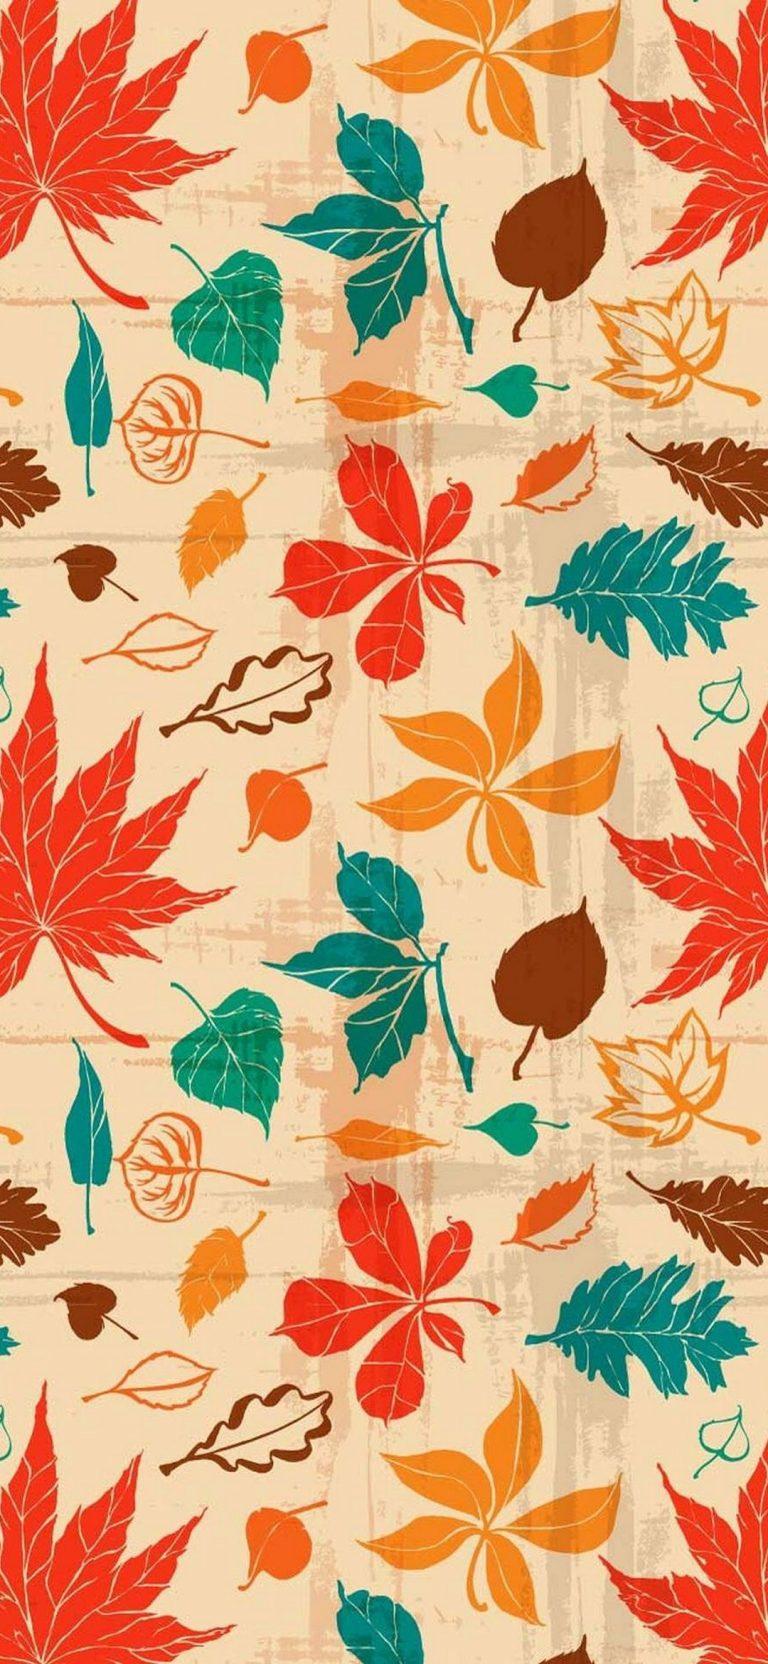 Autumn Phone Wallpaper 056 768x1664